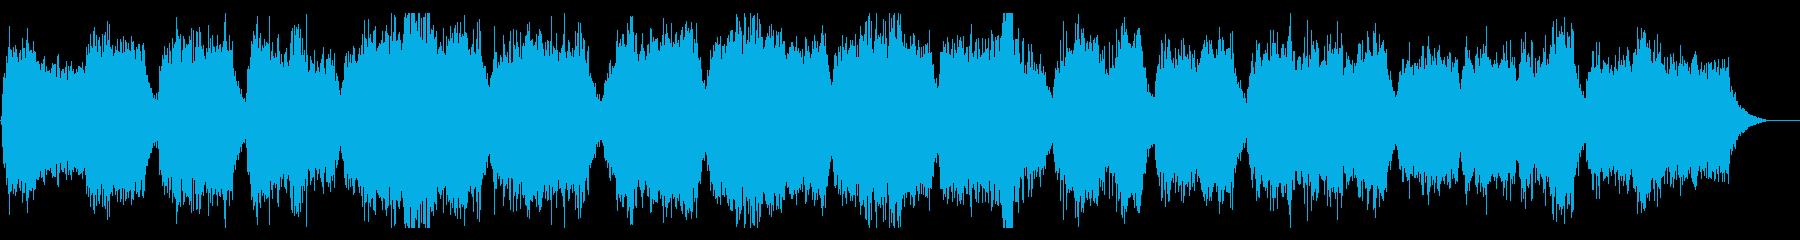 Urban legend ✡ Ikebo ★ Melancholy of the old man choir's reproduced waveform